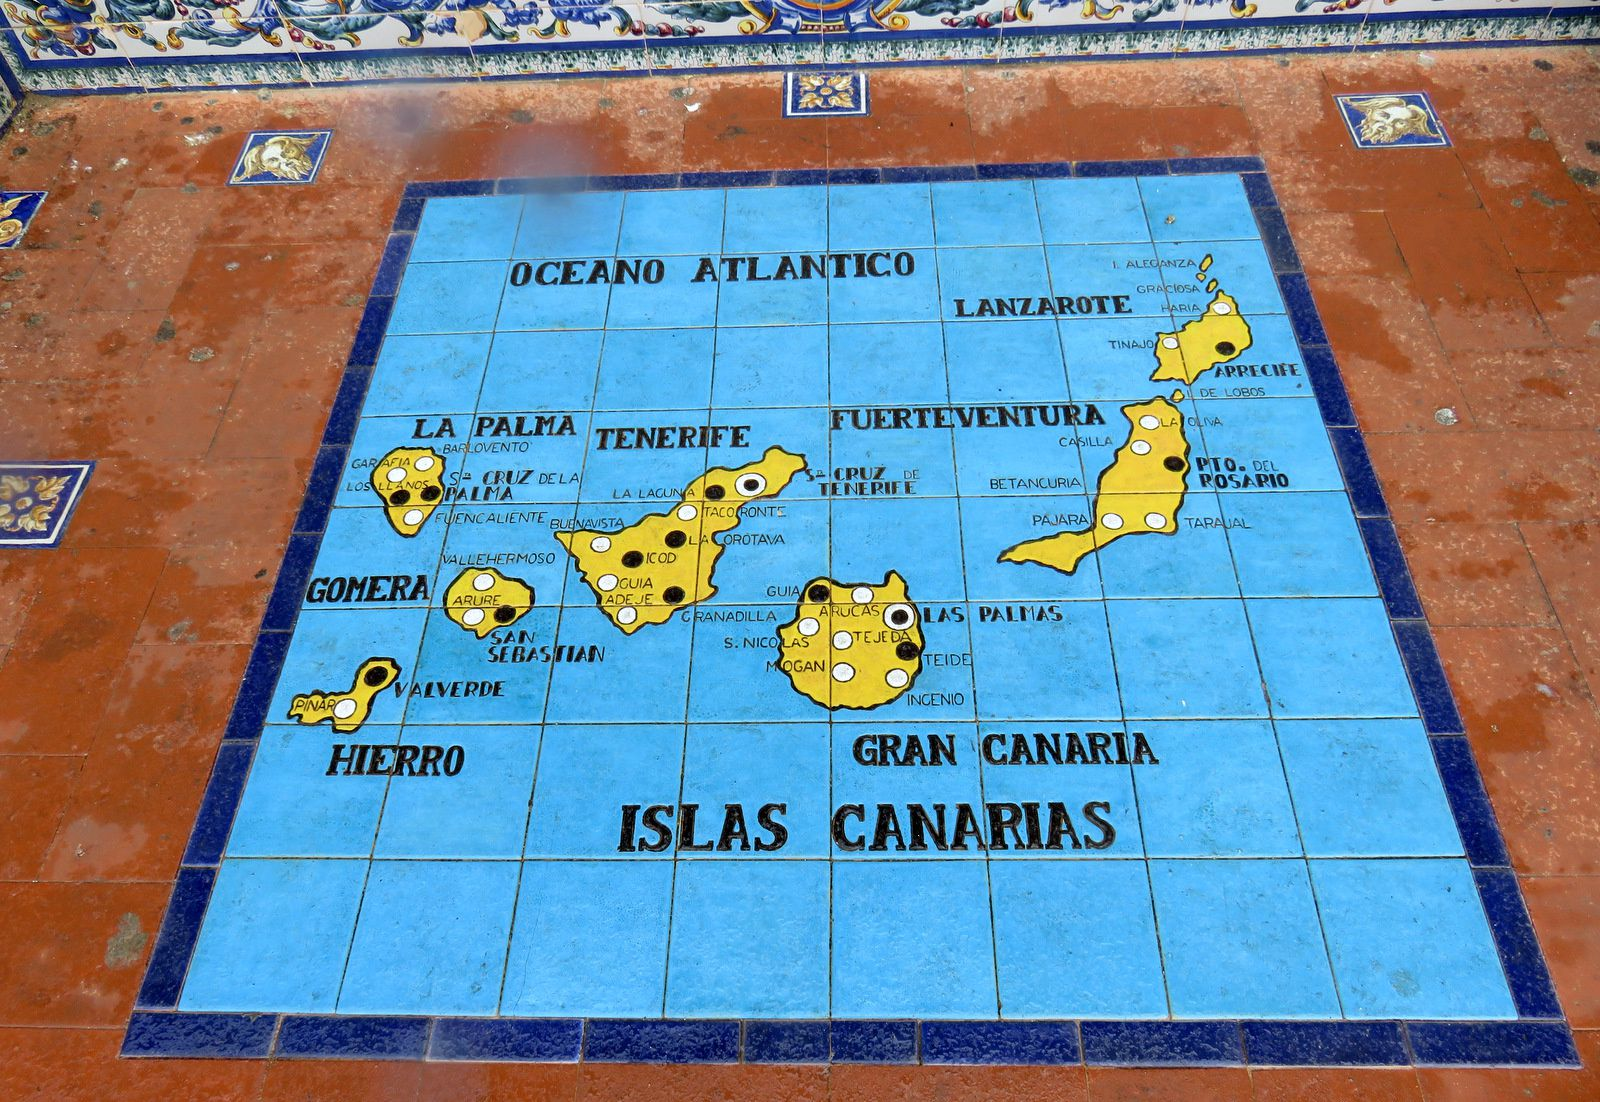 Banc des Iles Canaries, plaza de España (Séville)